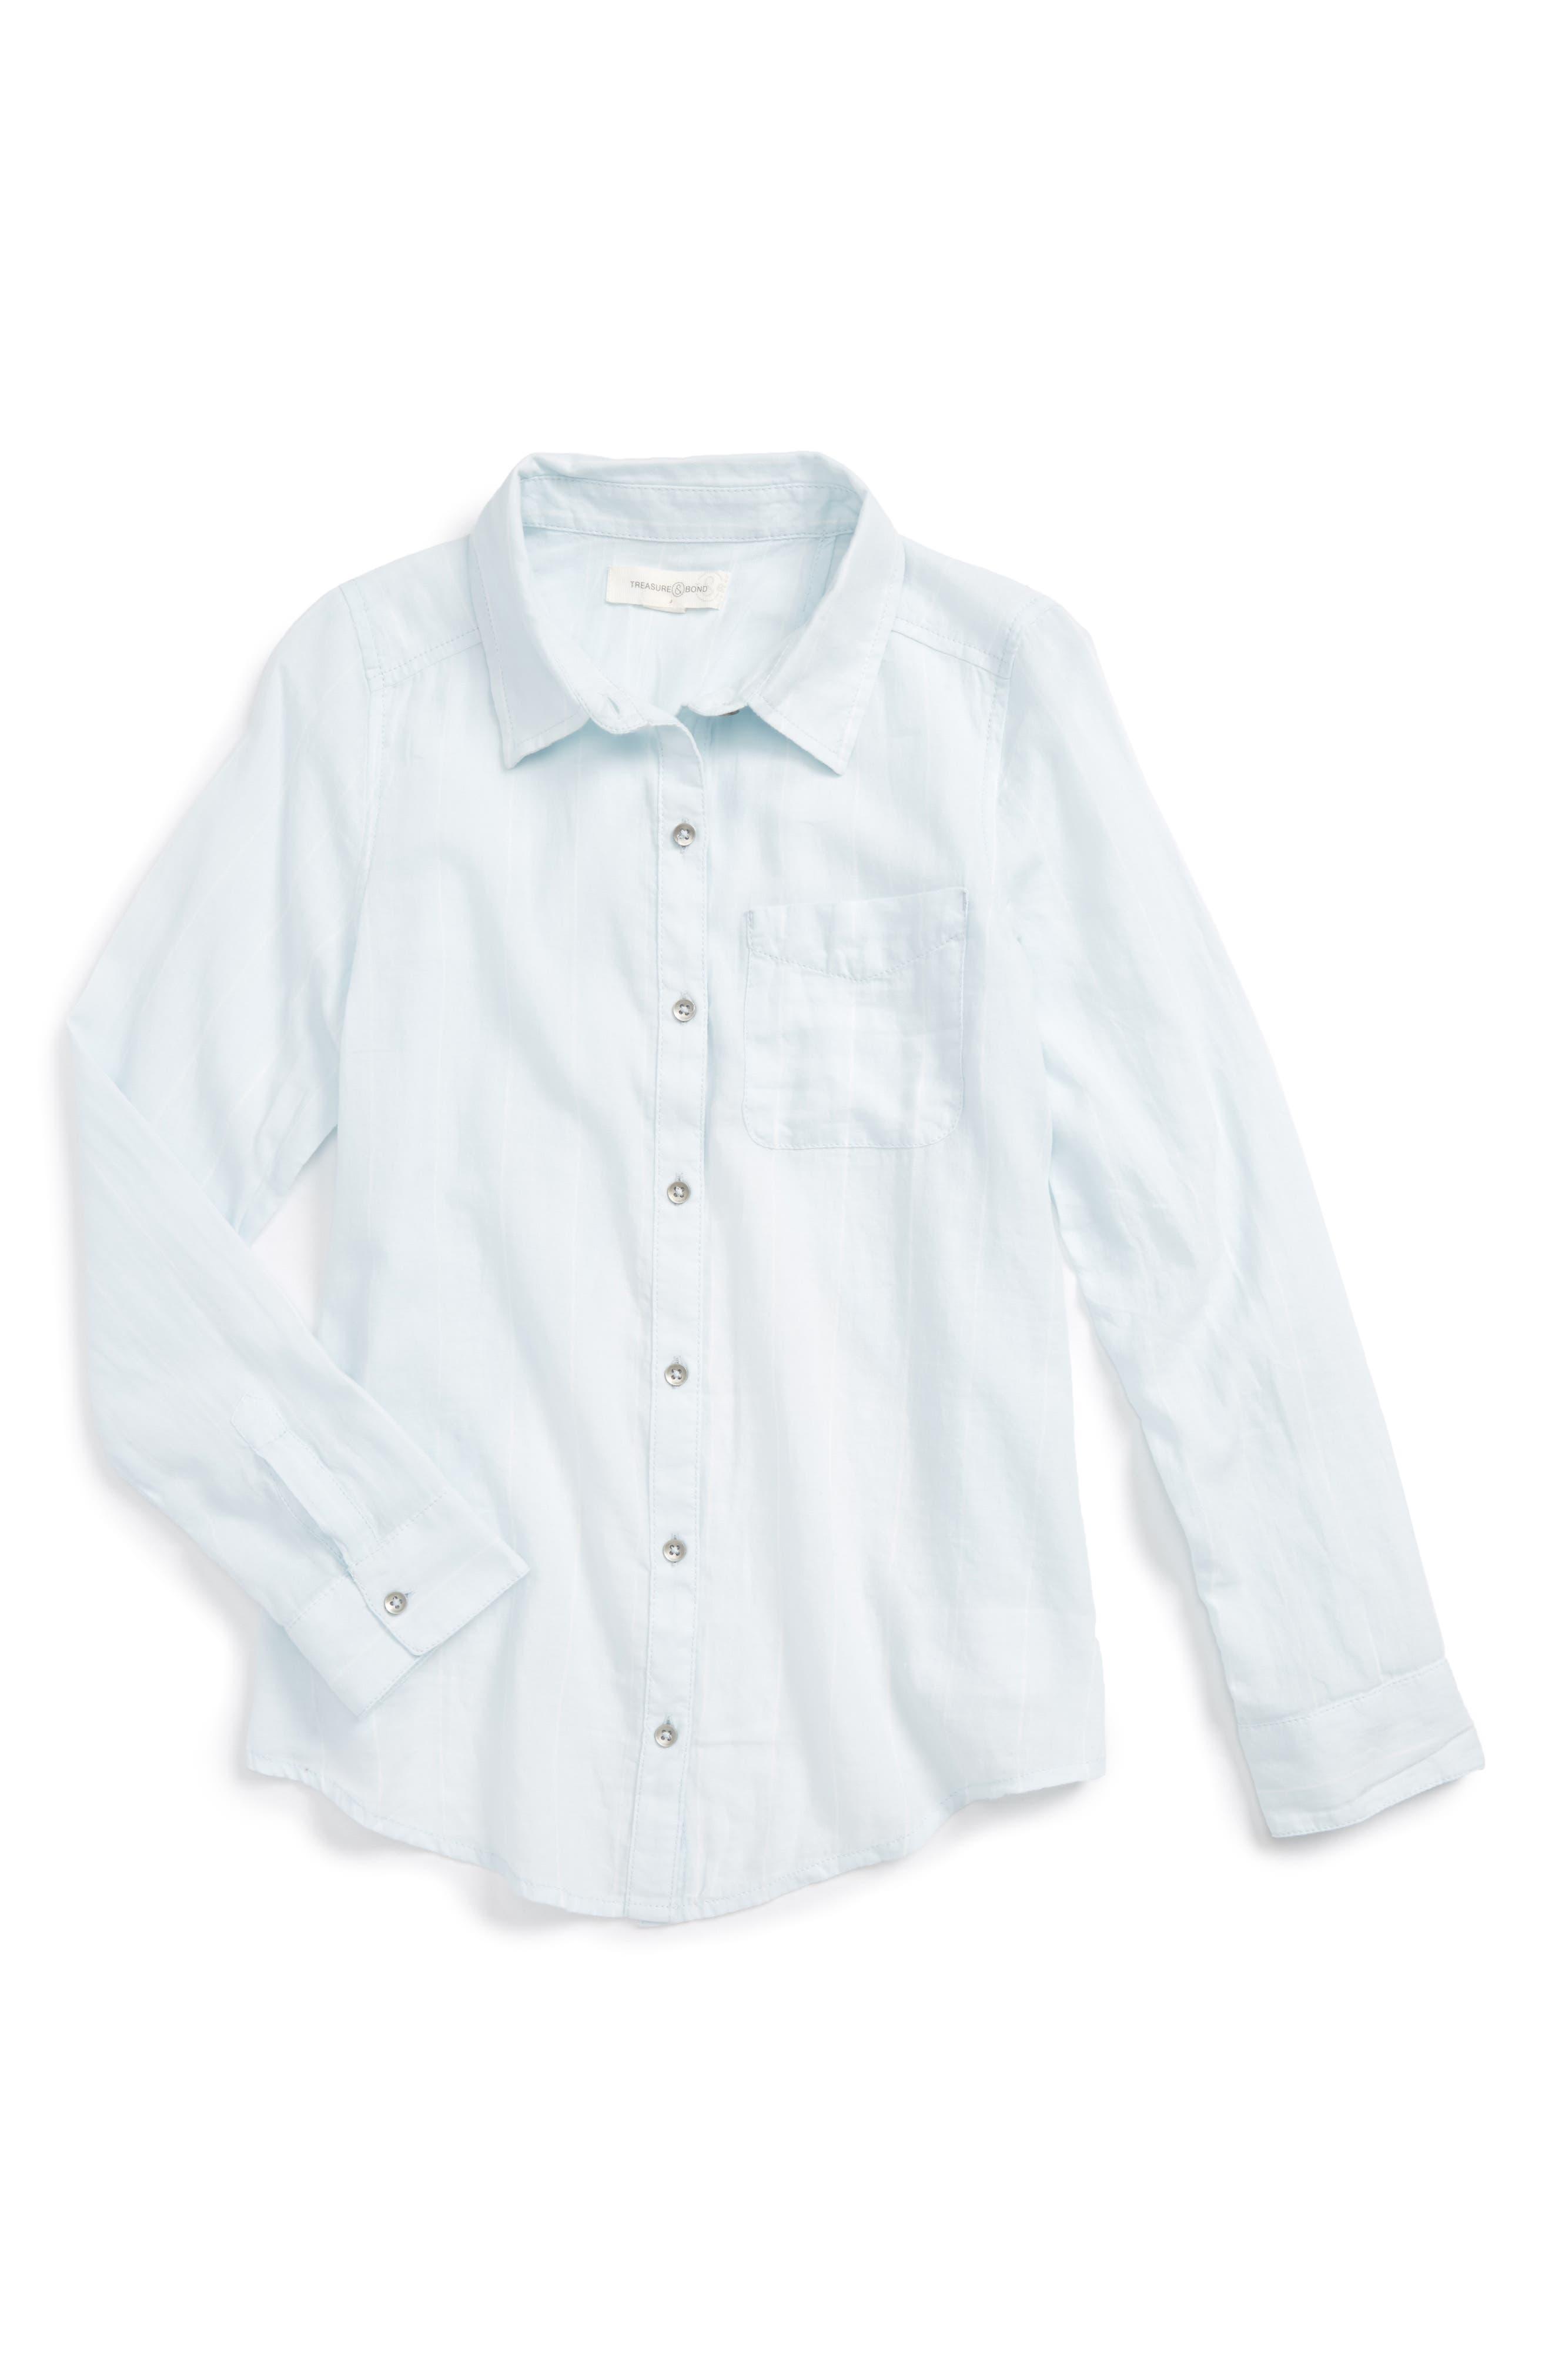 Alternate Image 1 Selected - Treasure & Bond Cross Back Flyaway Woven Shirt (Big Girls)